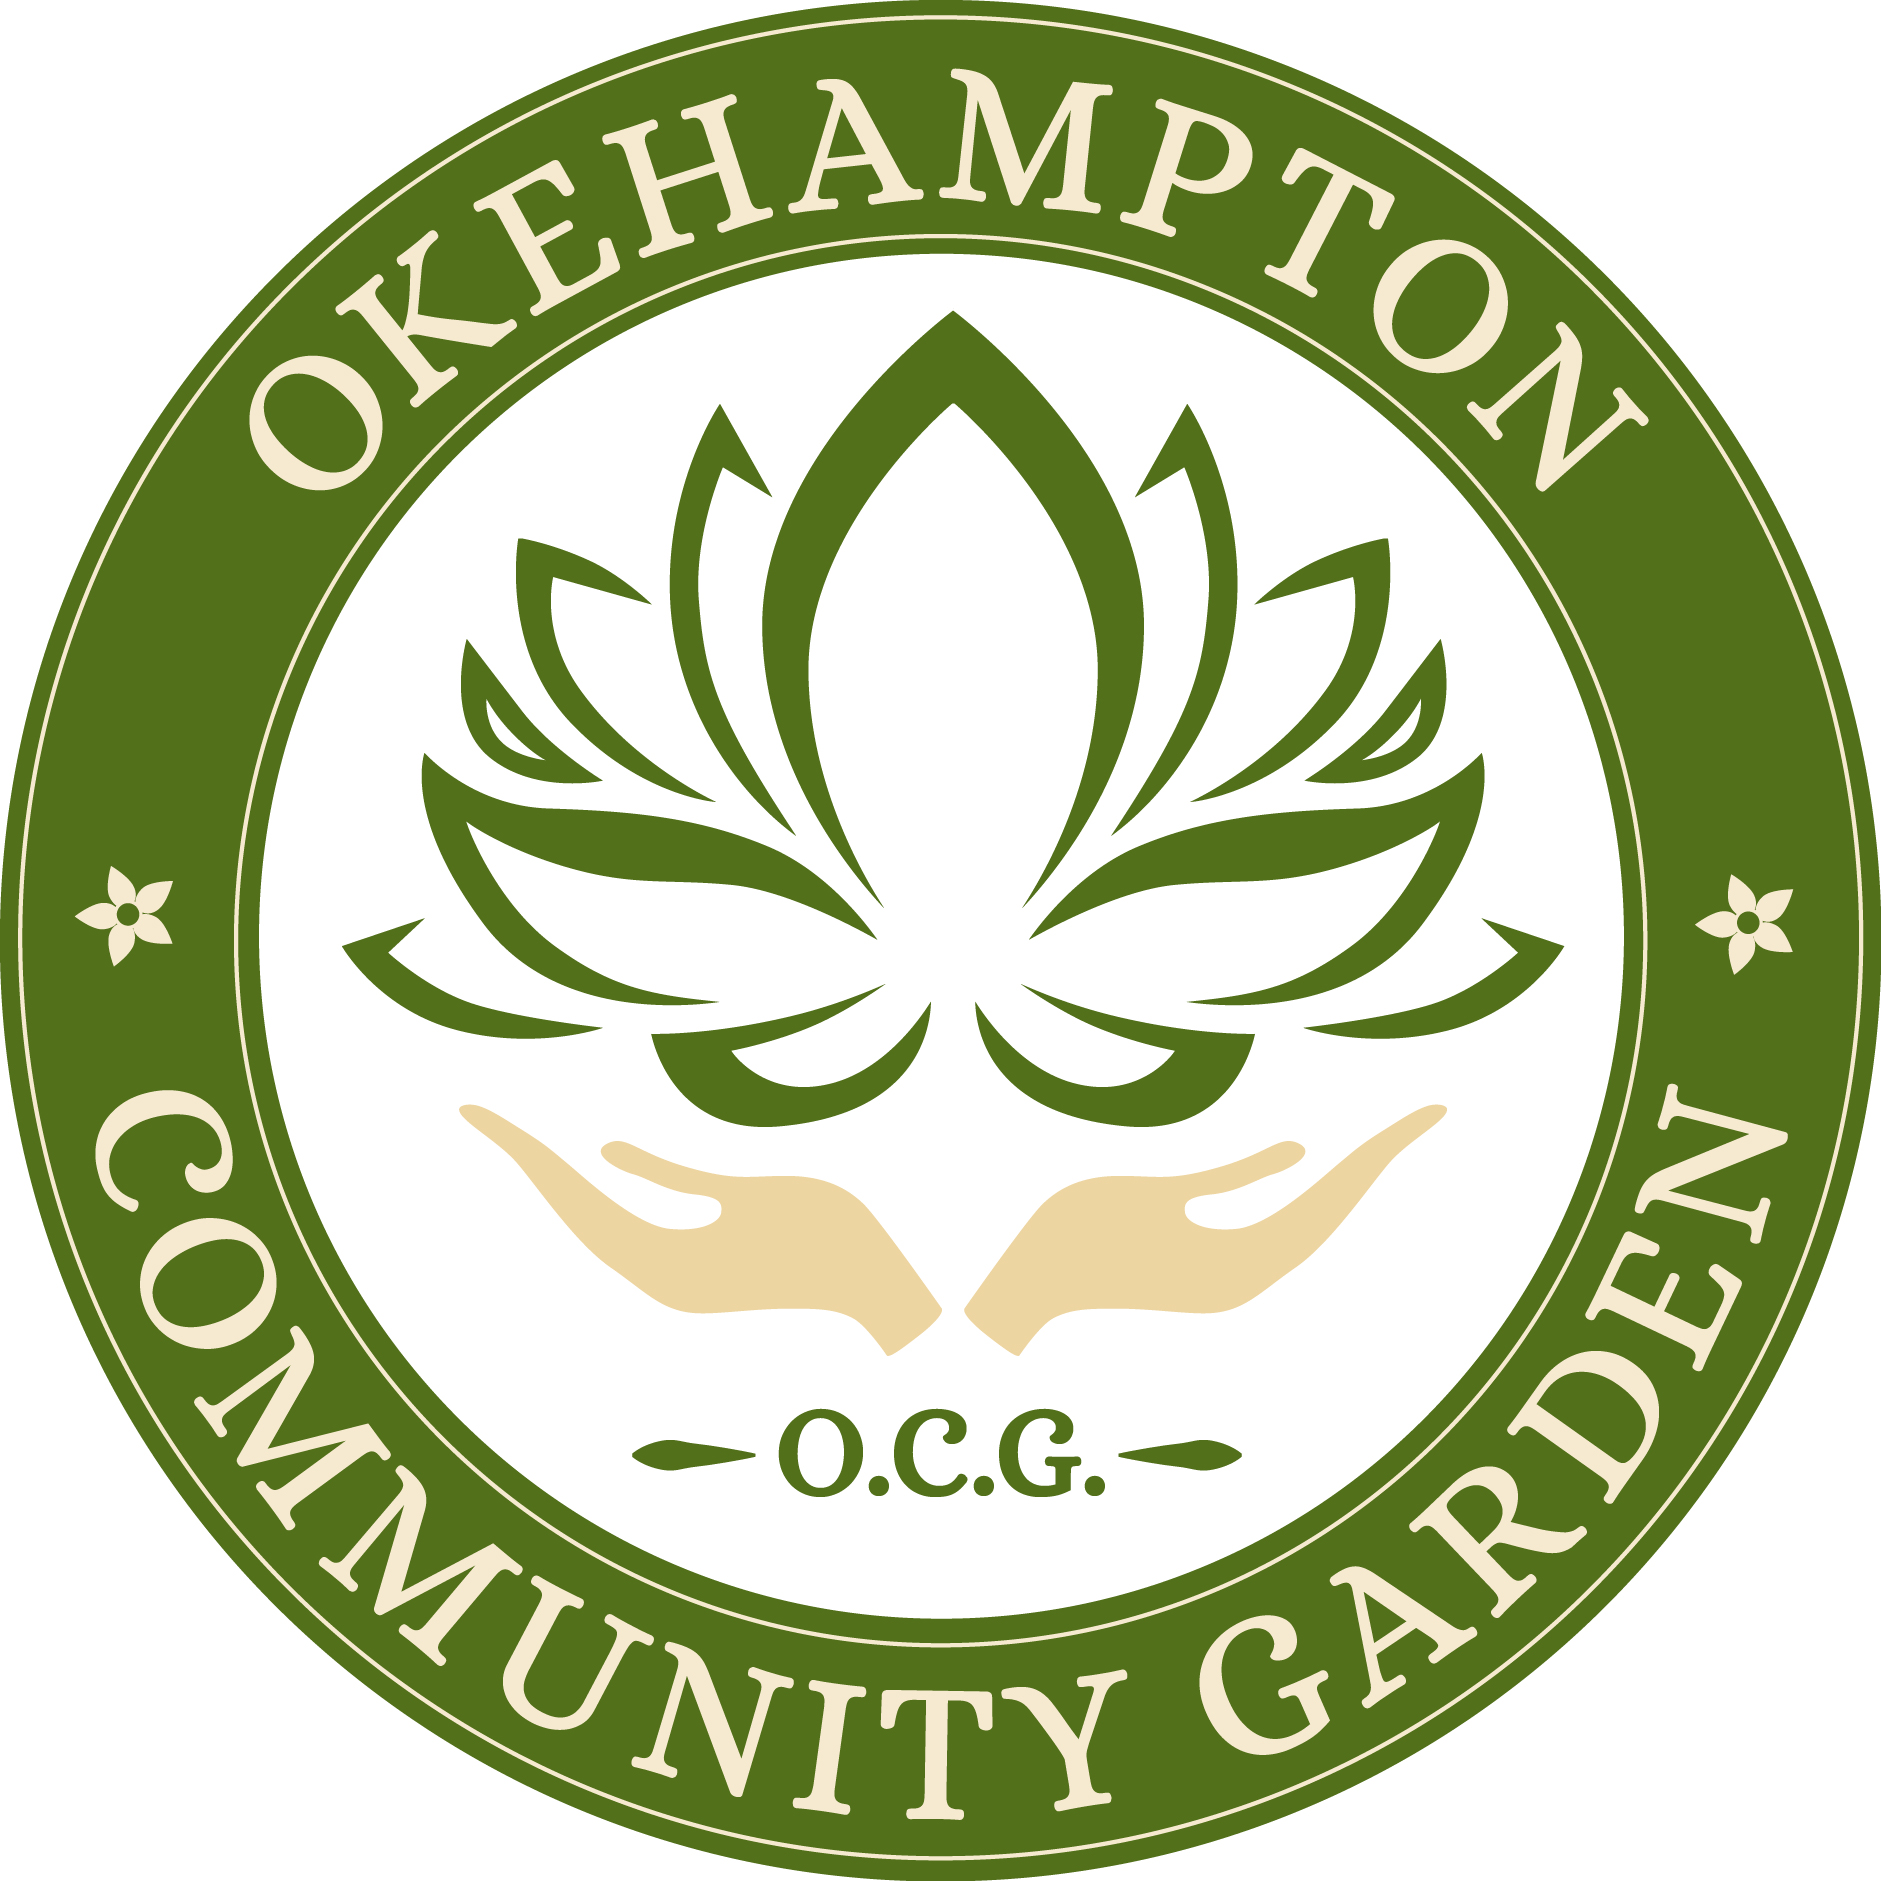 Okehampton Community Garden